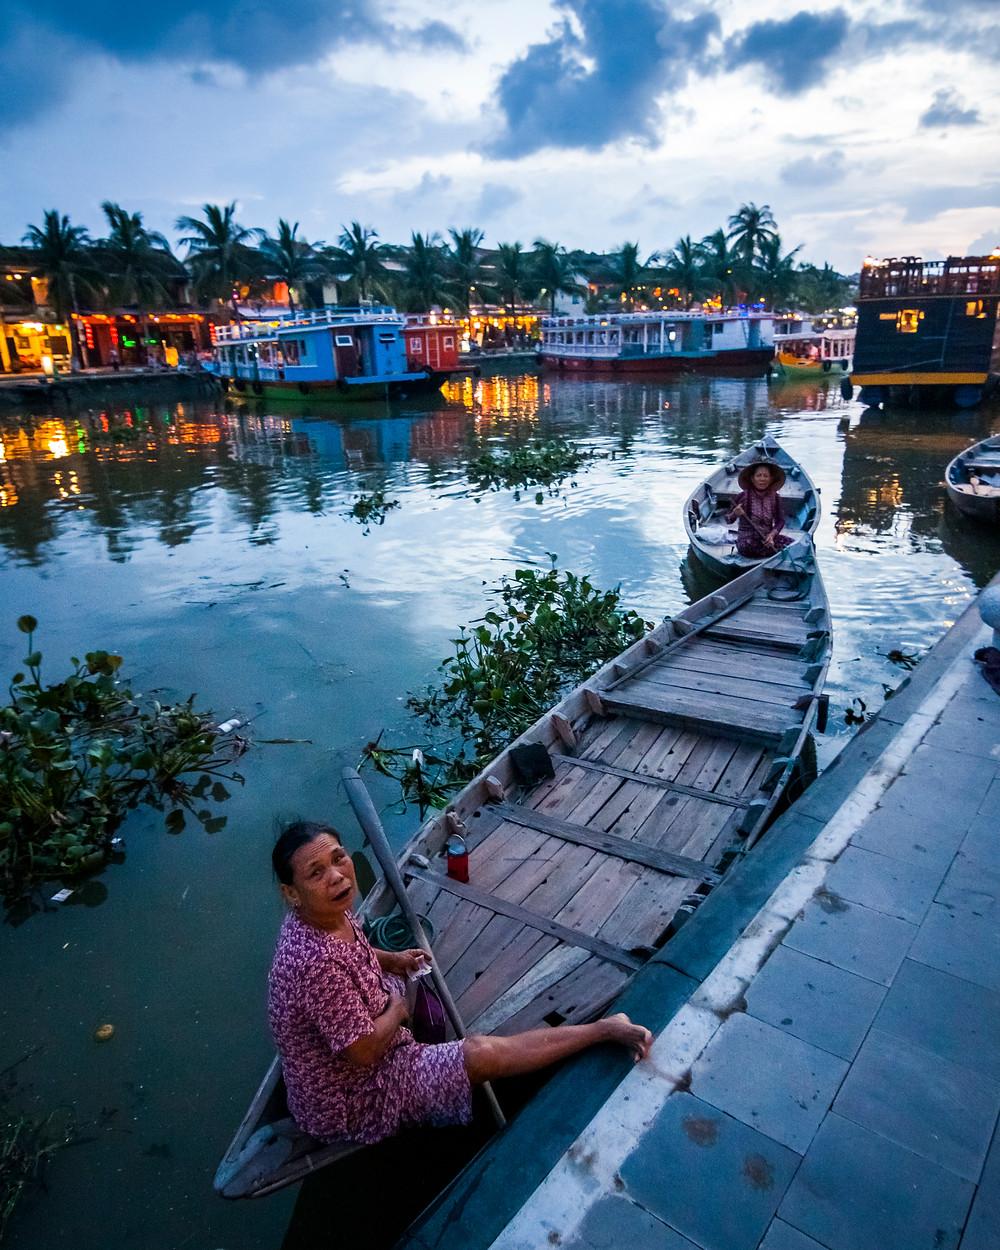 Boats on the Thu Bon River, Hoi An, Vietnam